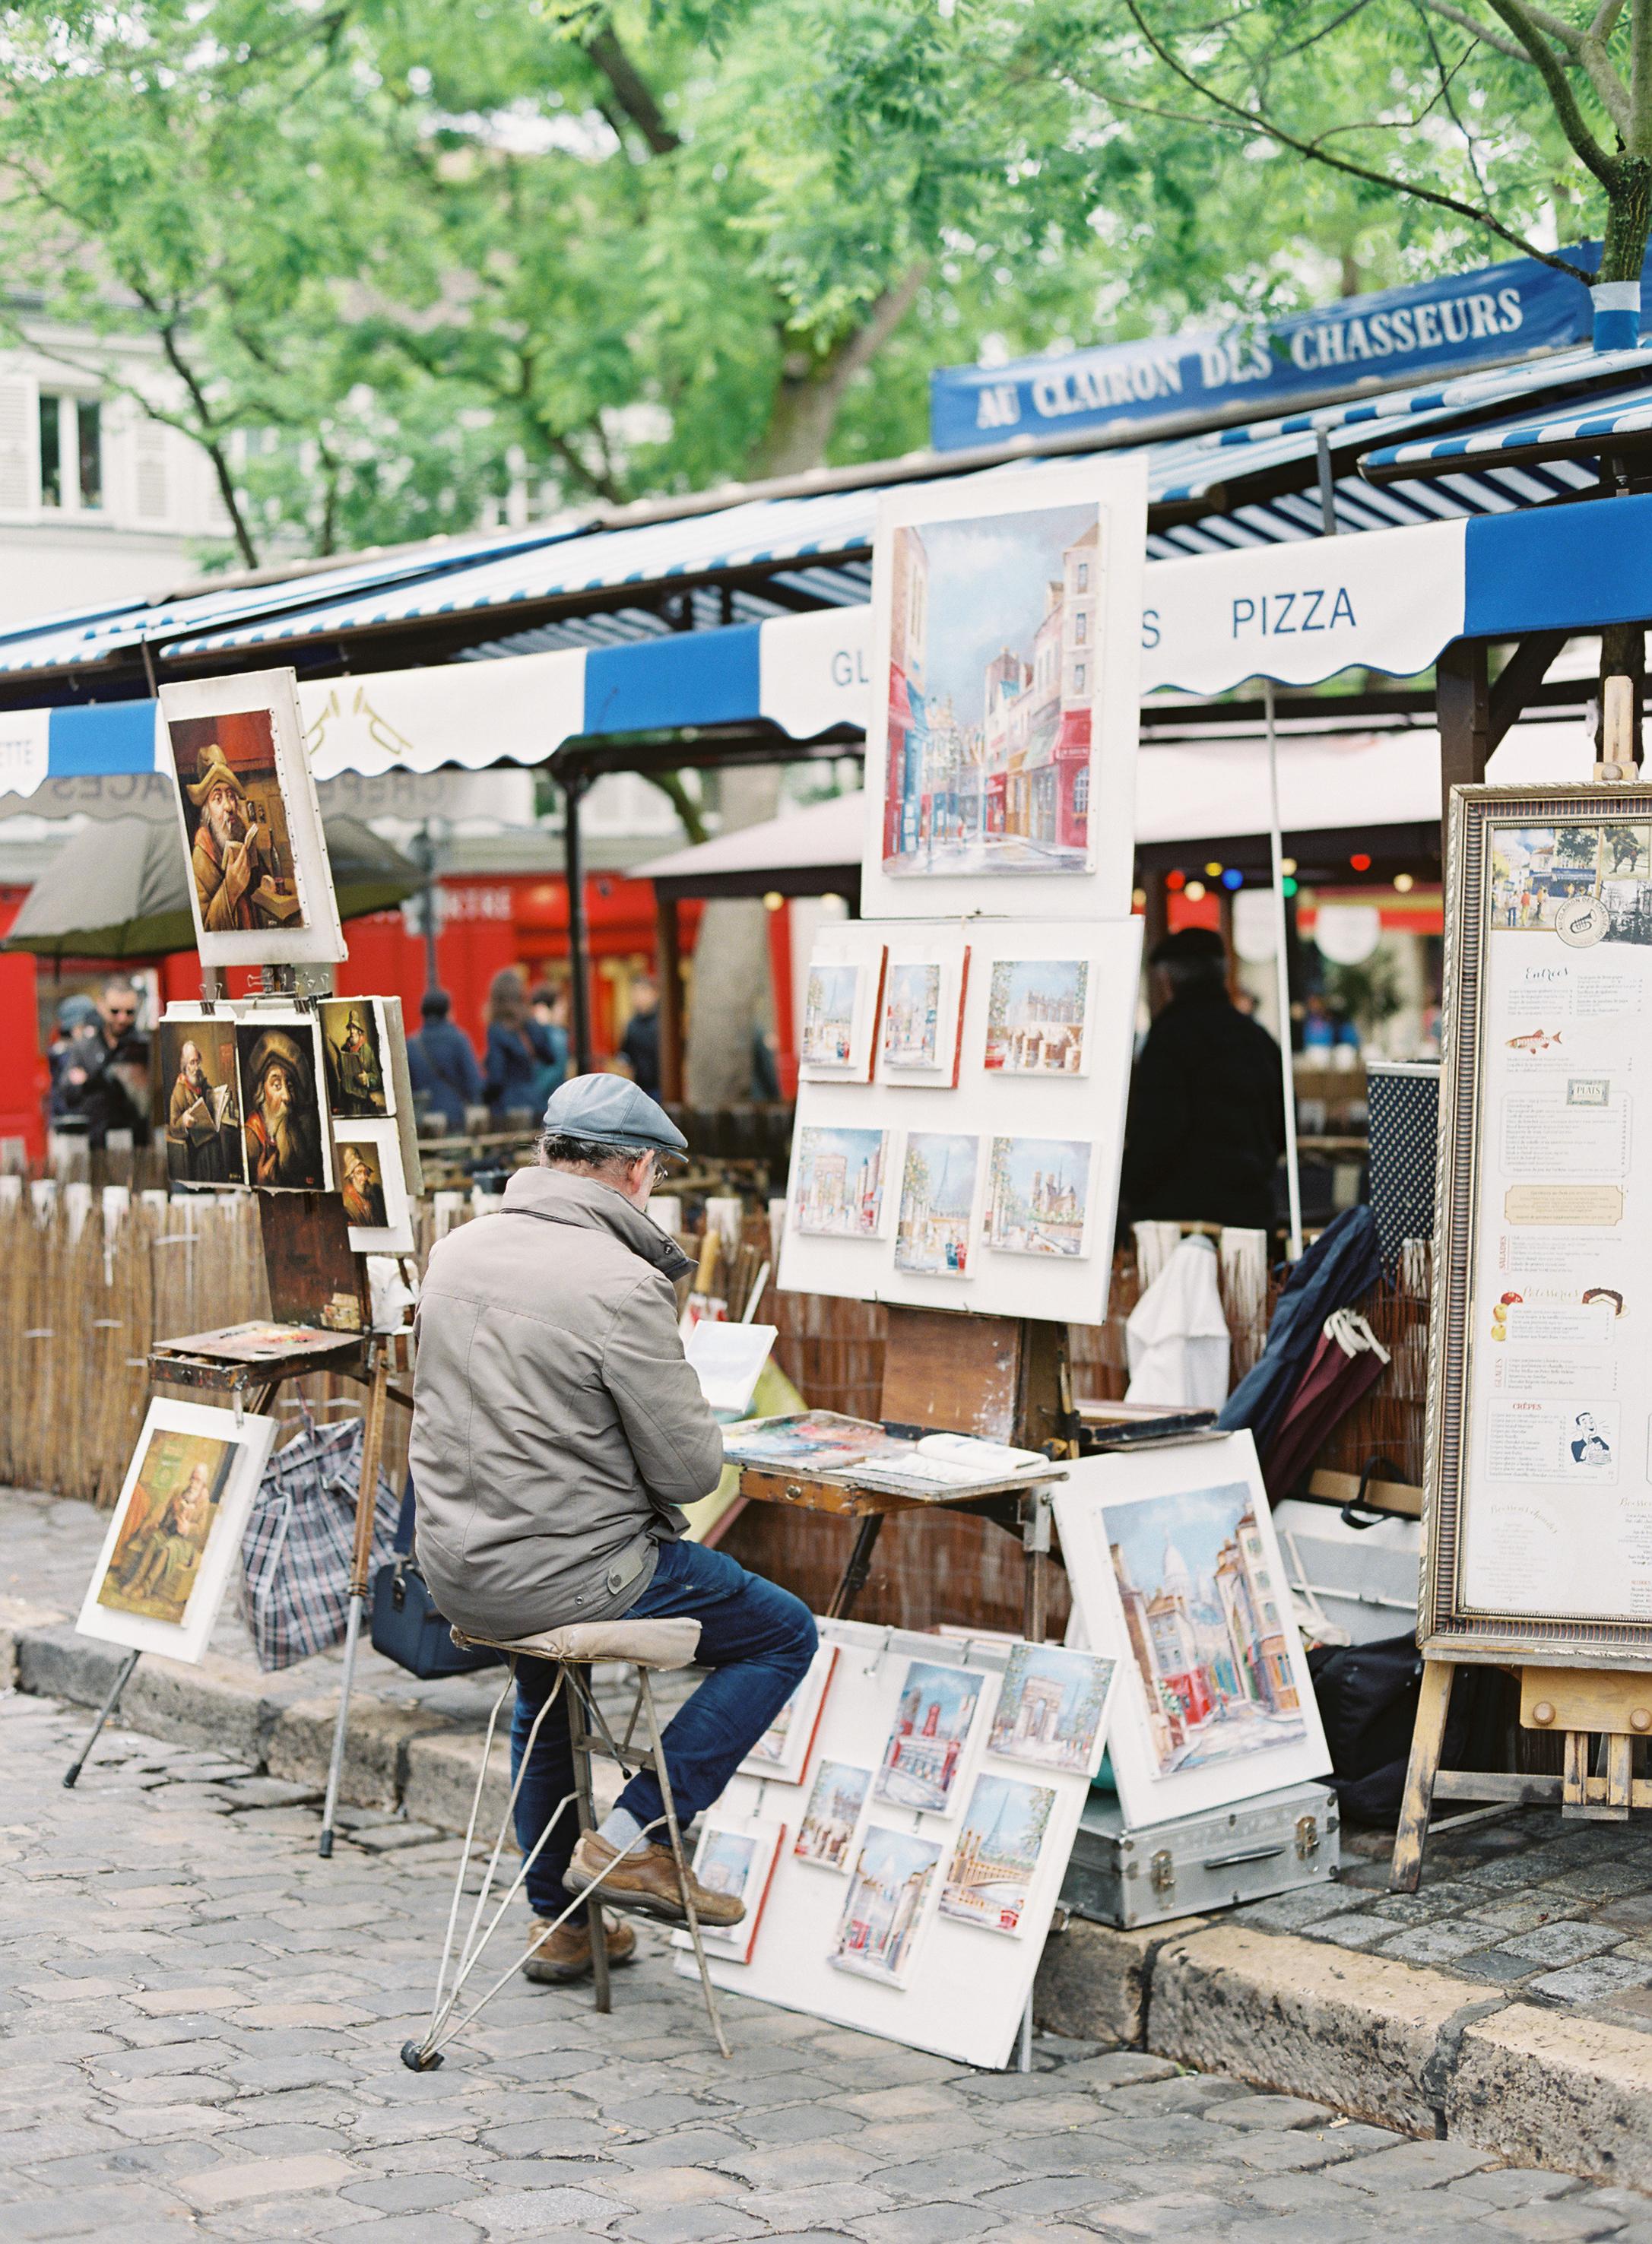 Paris France-Carrie King Photographer-149.jpg